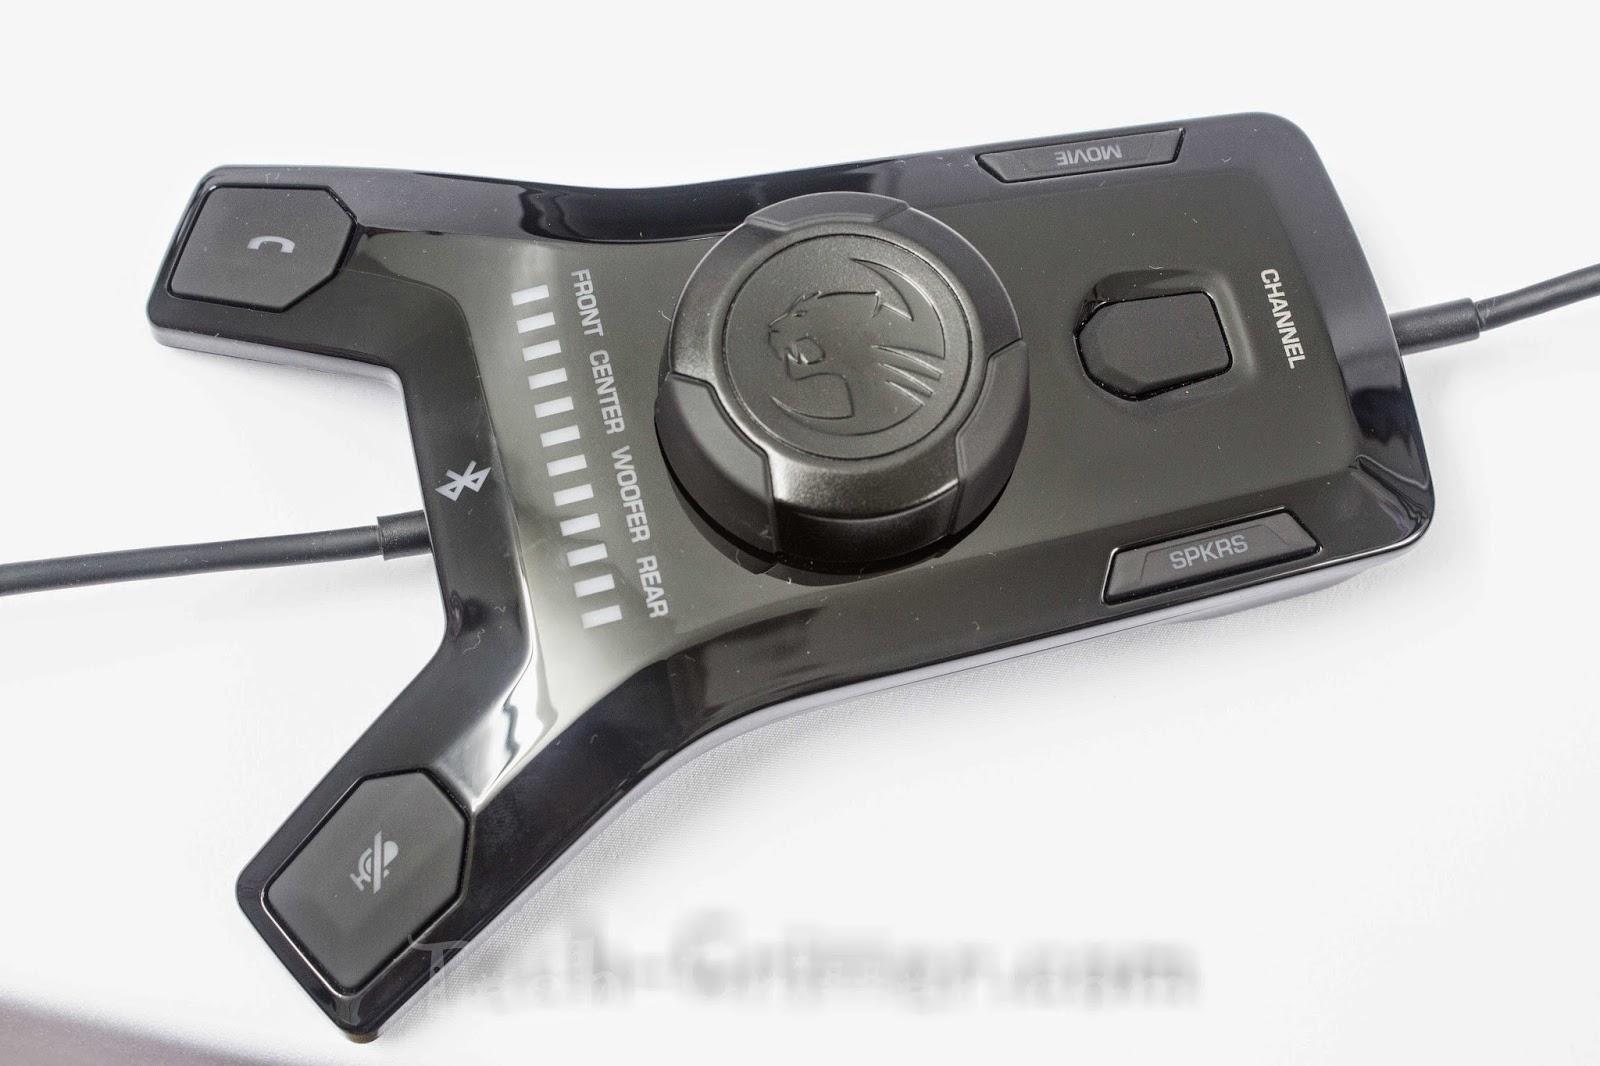 Unboxing & Review: Roccat Kave XTD 5.1 Digital Surround Sound Headset 60